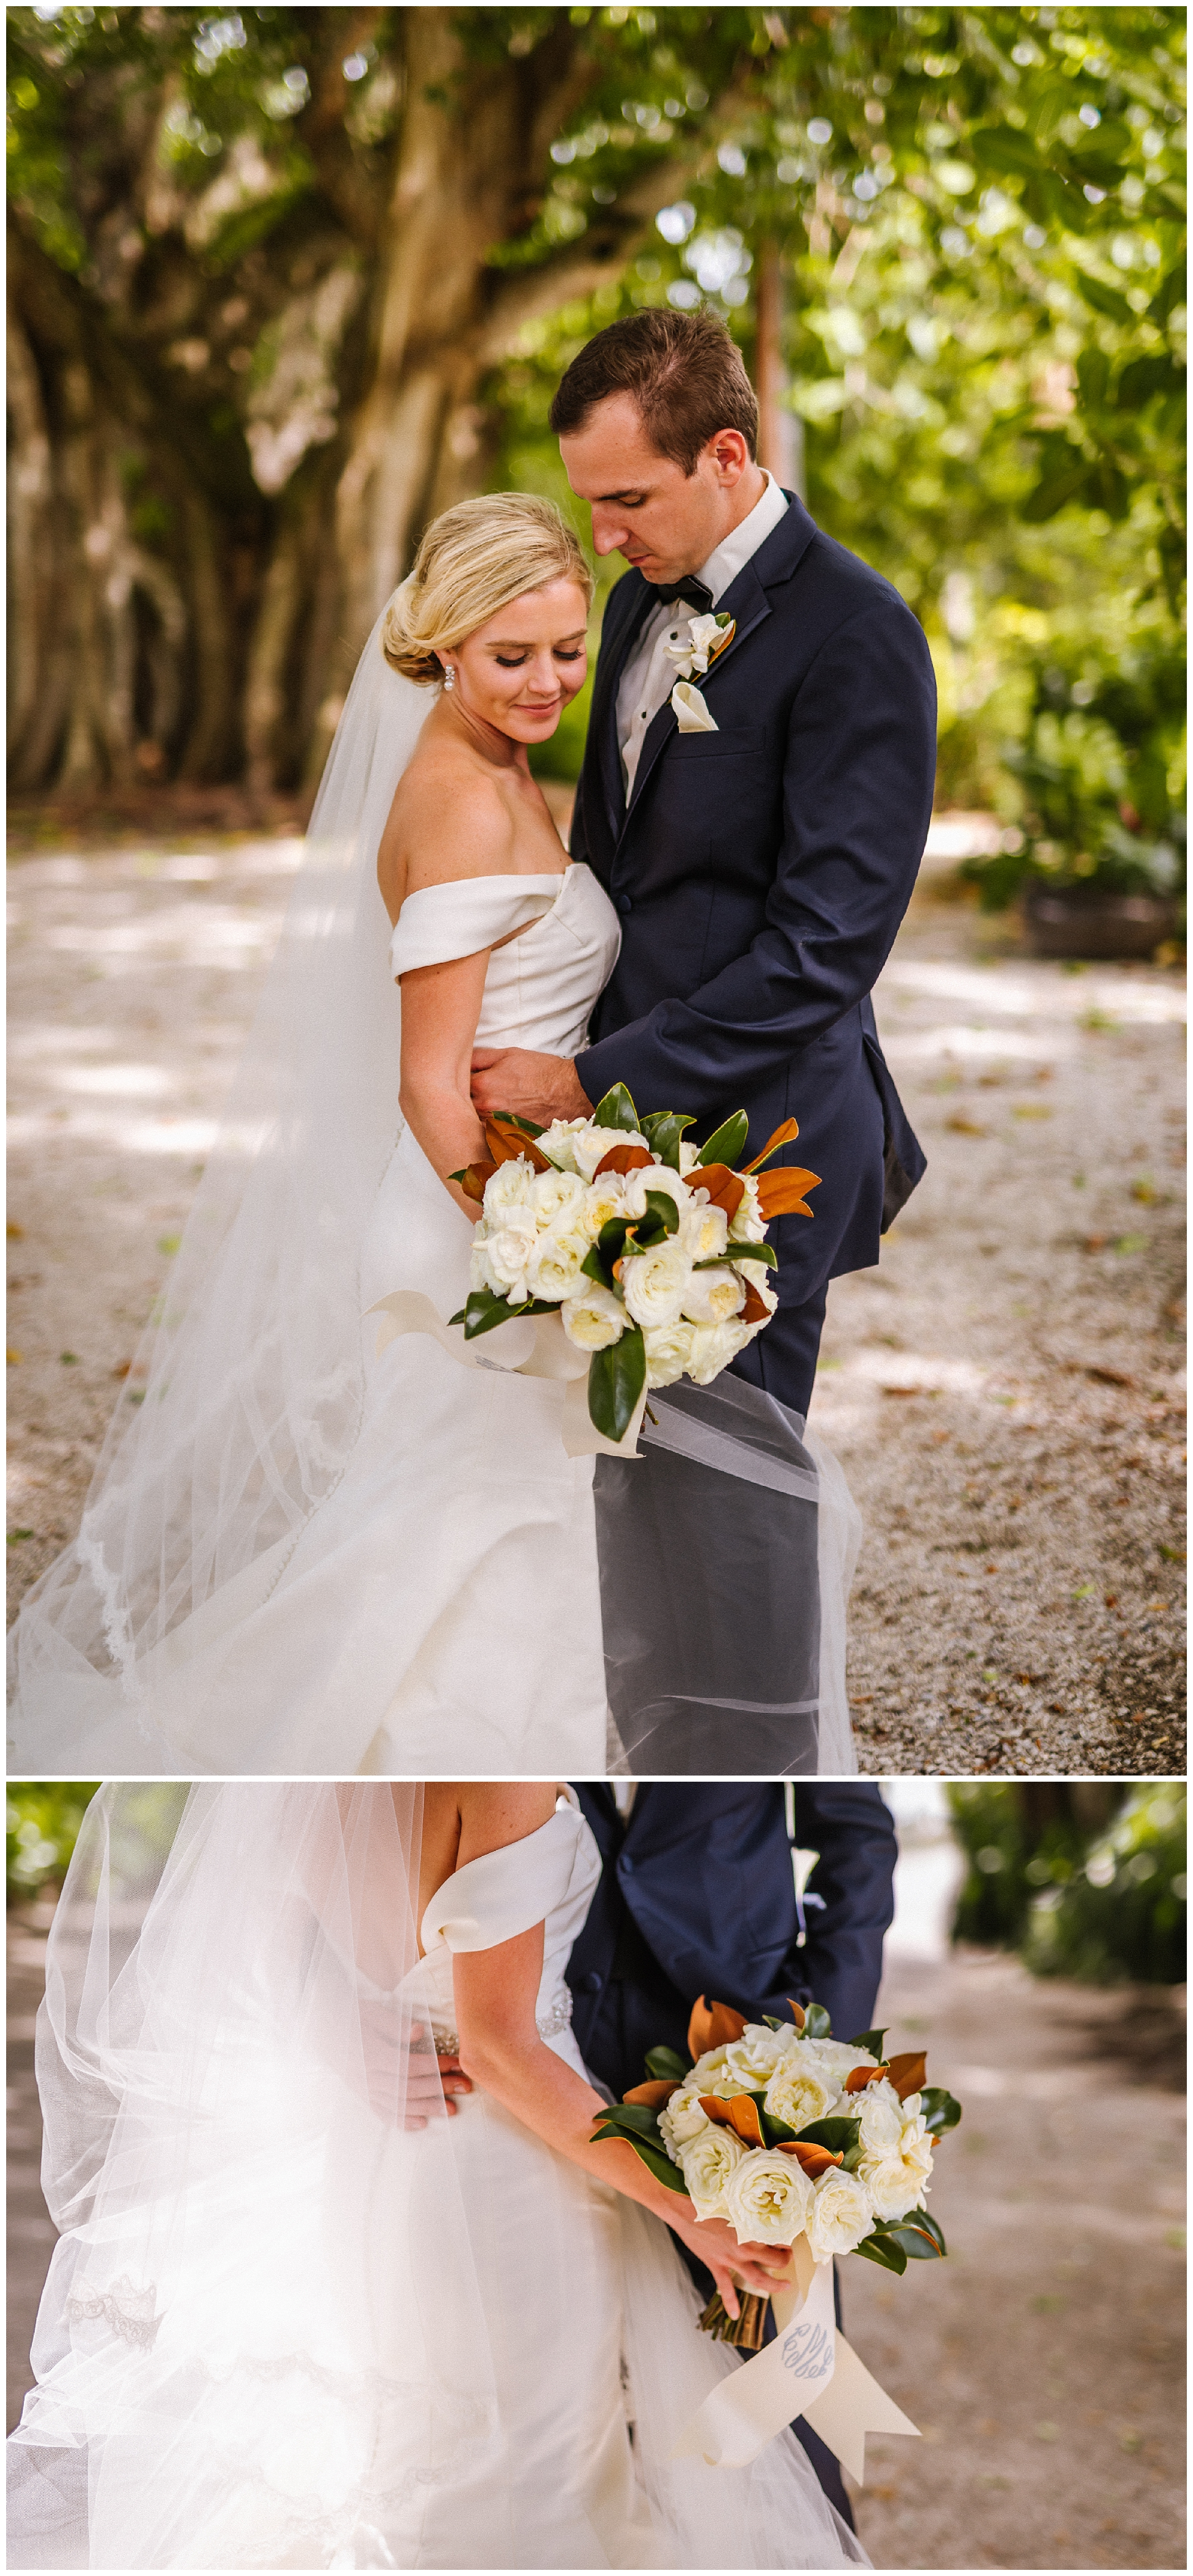 Ashlee-hamon-photography-year-in-review-2016-travel-wanderlust-vsco-adventure-wedding_0113.jpg